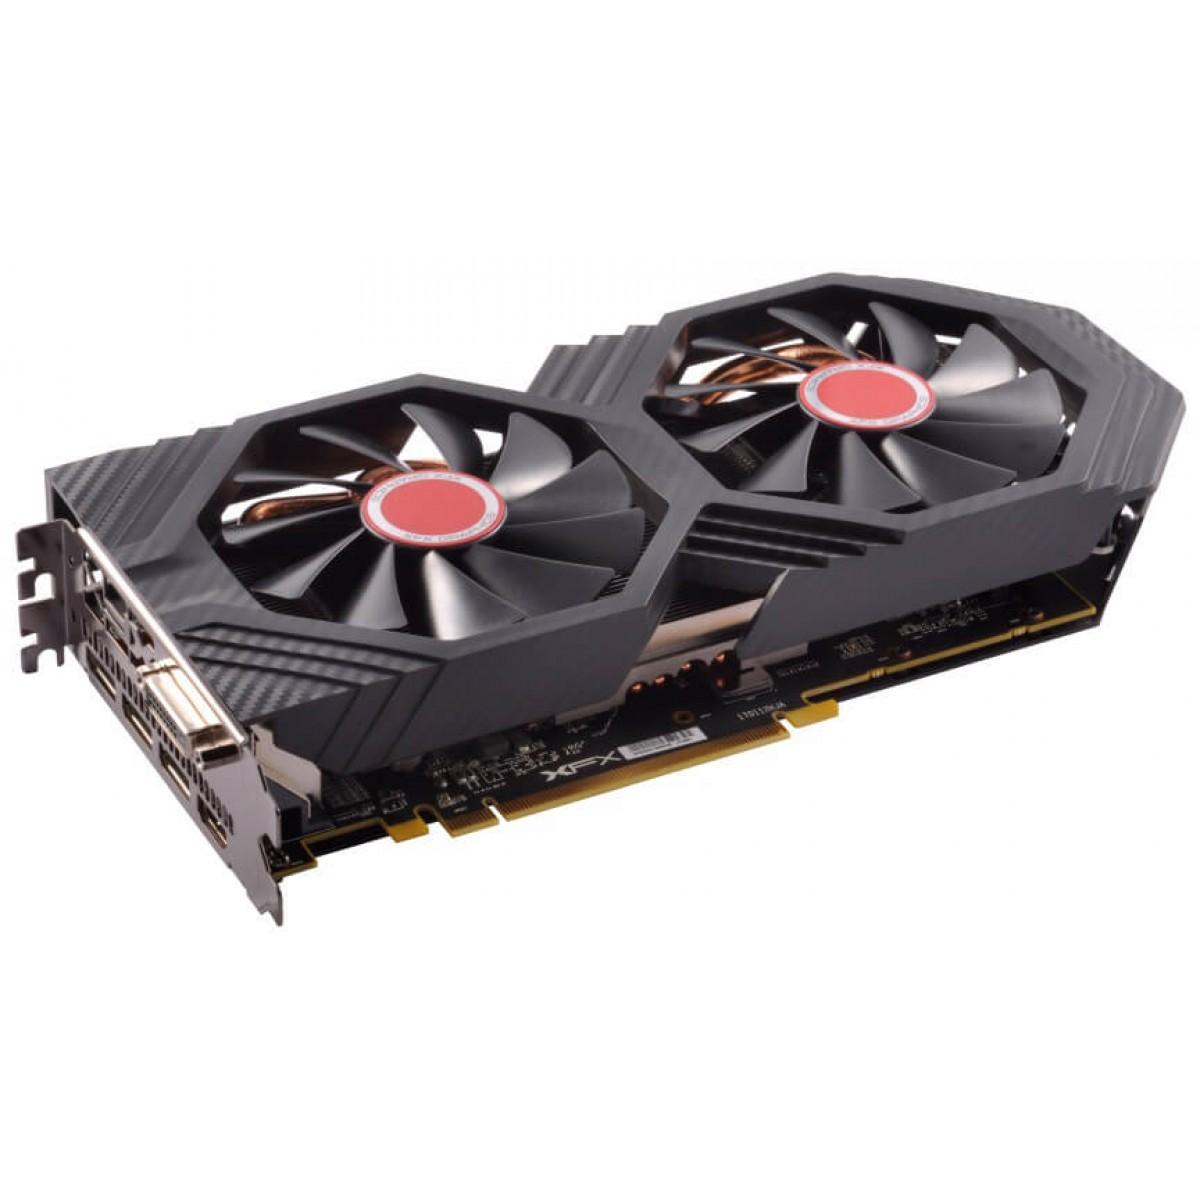 Placa de Vídeo XFX Radeon RX 580, GTS Black Edition, 8GB, Dual Fan OC+